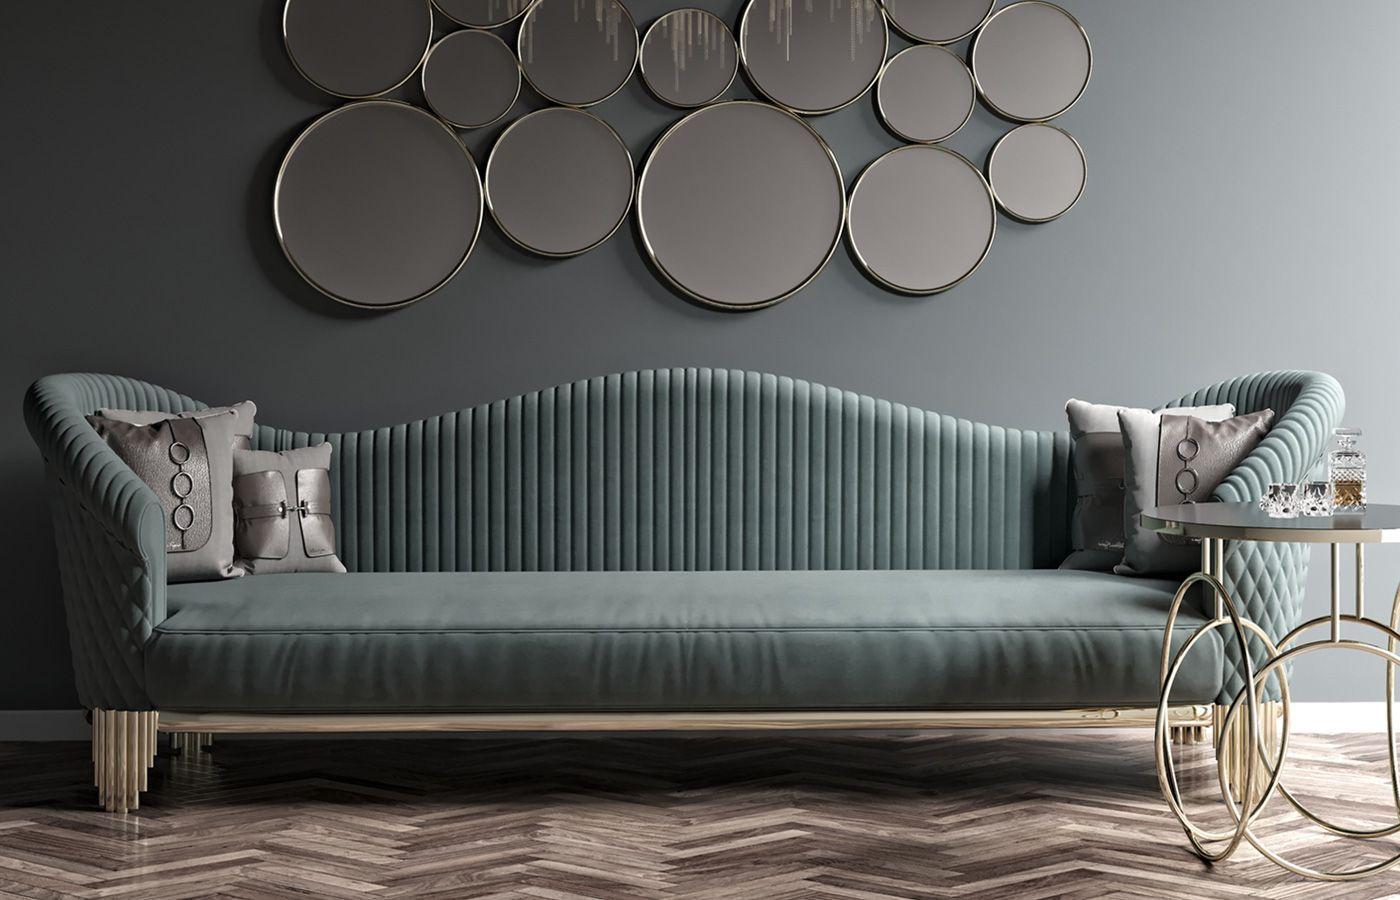 Zebrano Furniture Luxury Furniture Modern Classic And Avantgarde Luxury Furniture Design Living Room Sofa Design Luxury Sofa Design